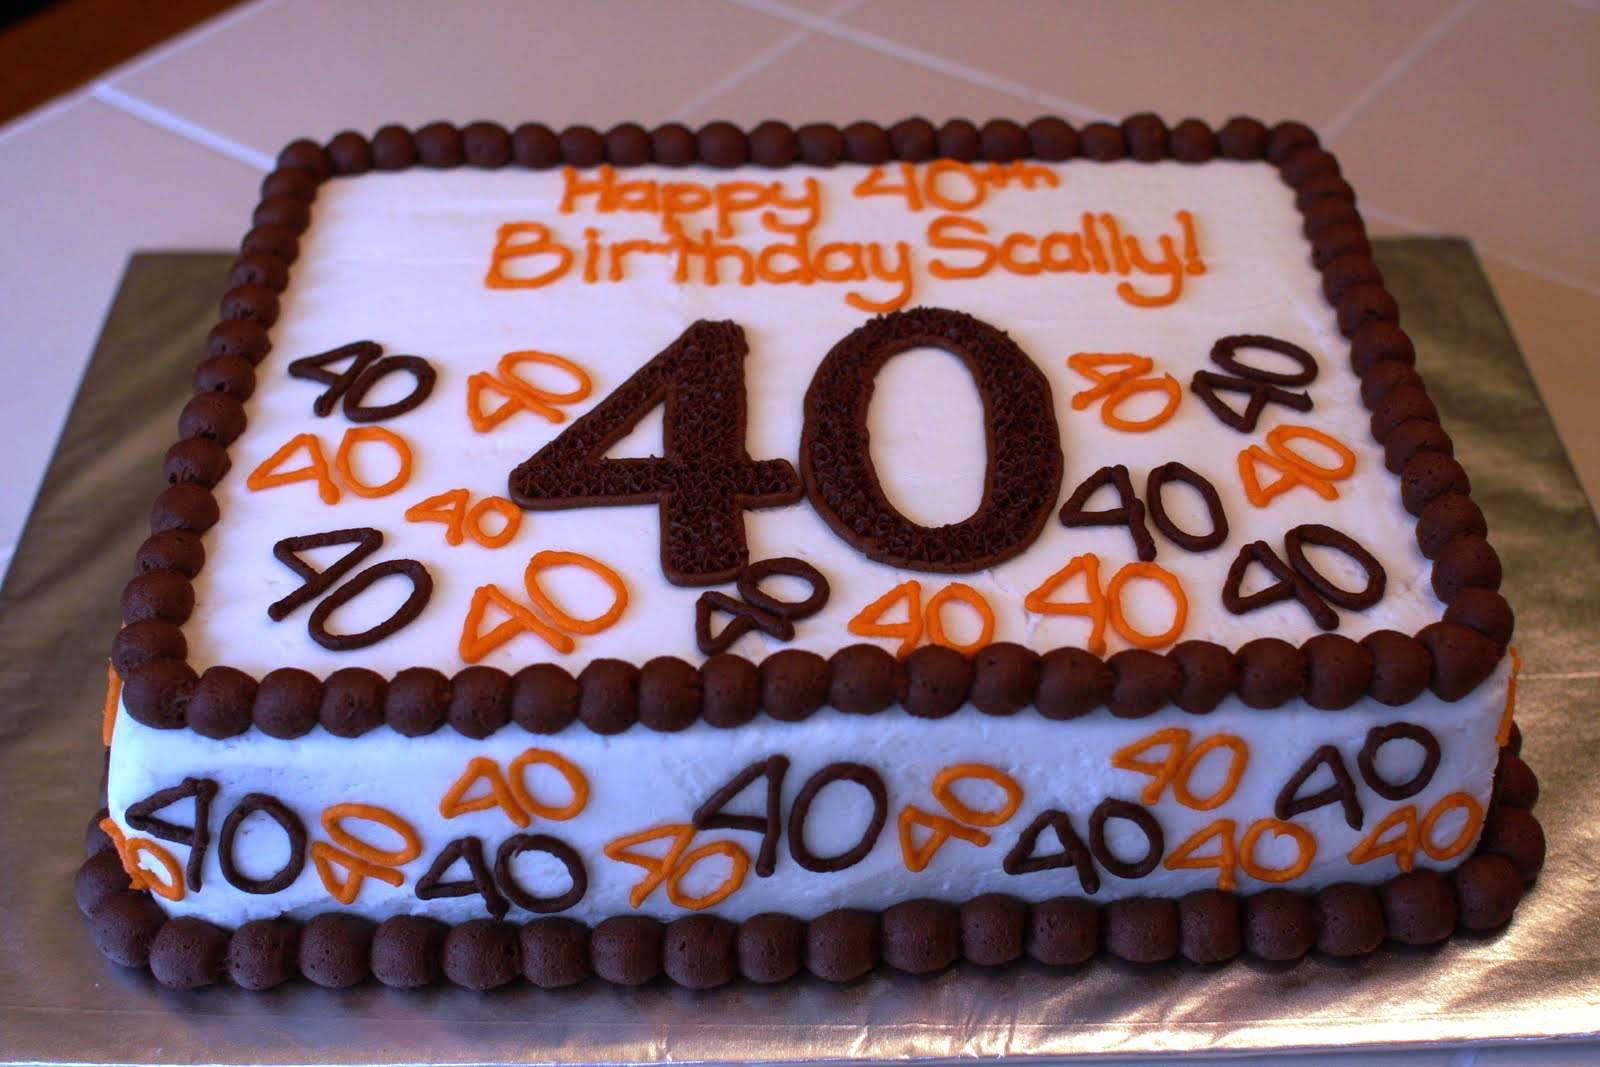 40Th Birthday Cake Ideas 40th Birthday Cake Ideas For Men Protoblogr Design 40th Birthday